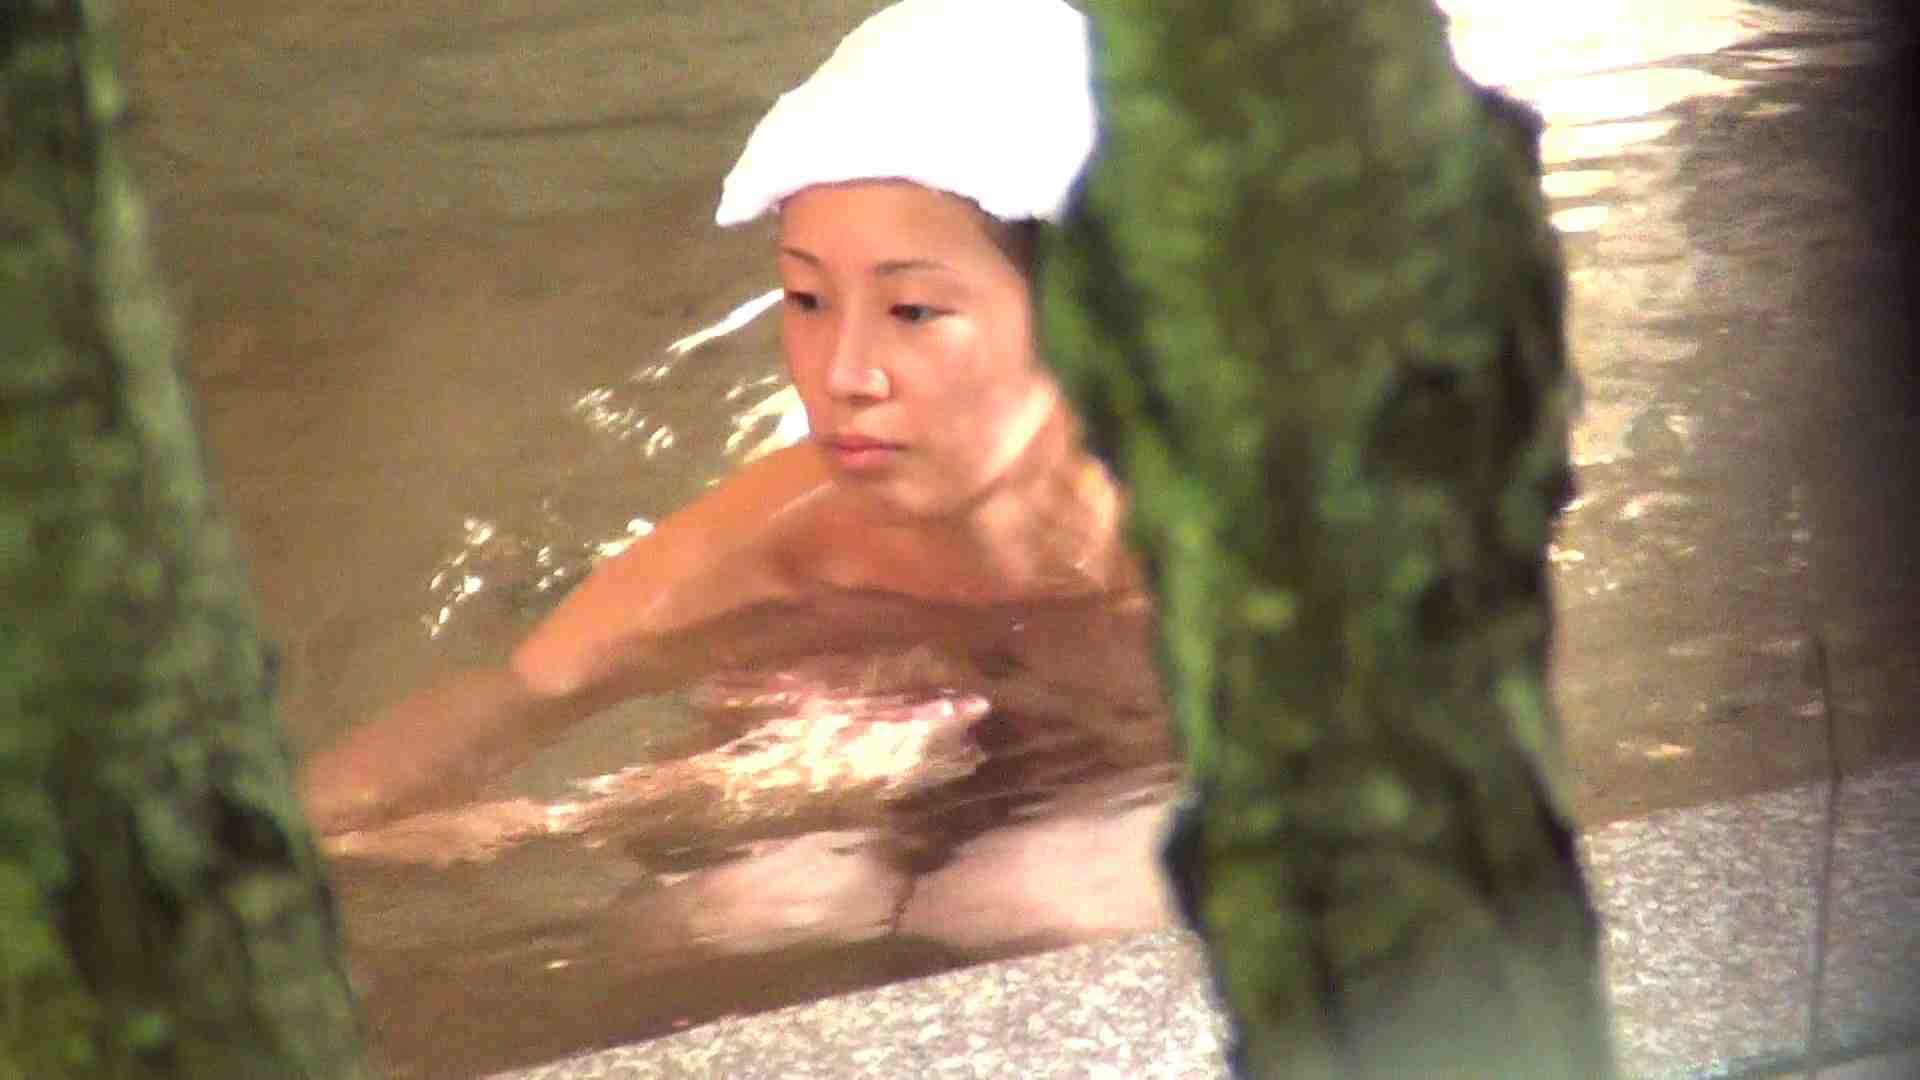 Aquaな露天風呂Vol.281 OLセックス   盗撮  78画像 70